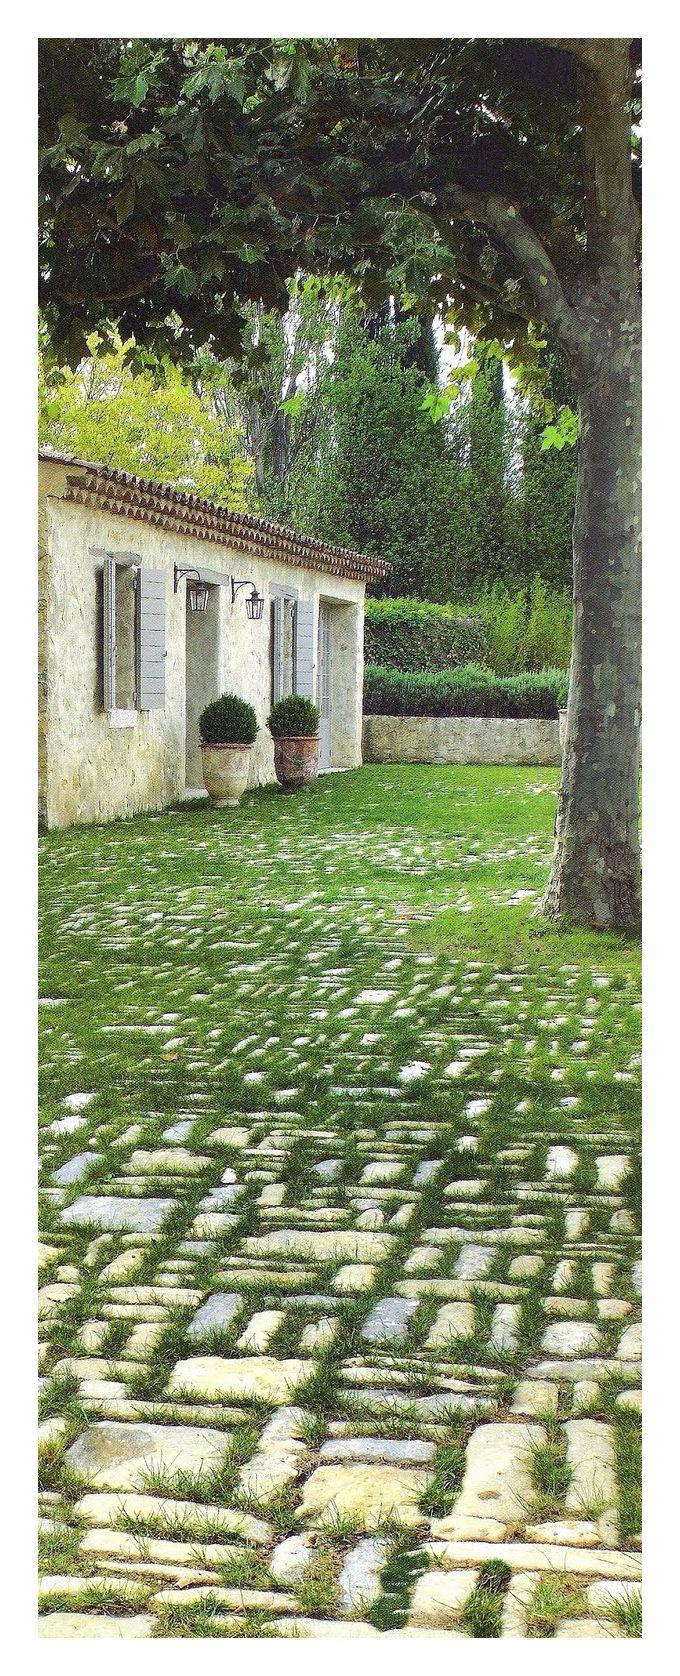 12 Best Showcase Images On Pinterest Grass Herb And Lawn # Bordure De Jardin Green Park